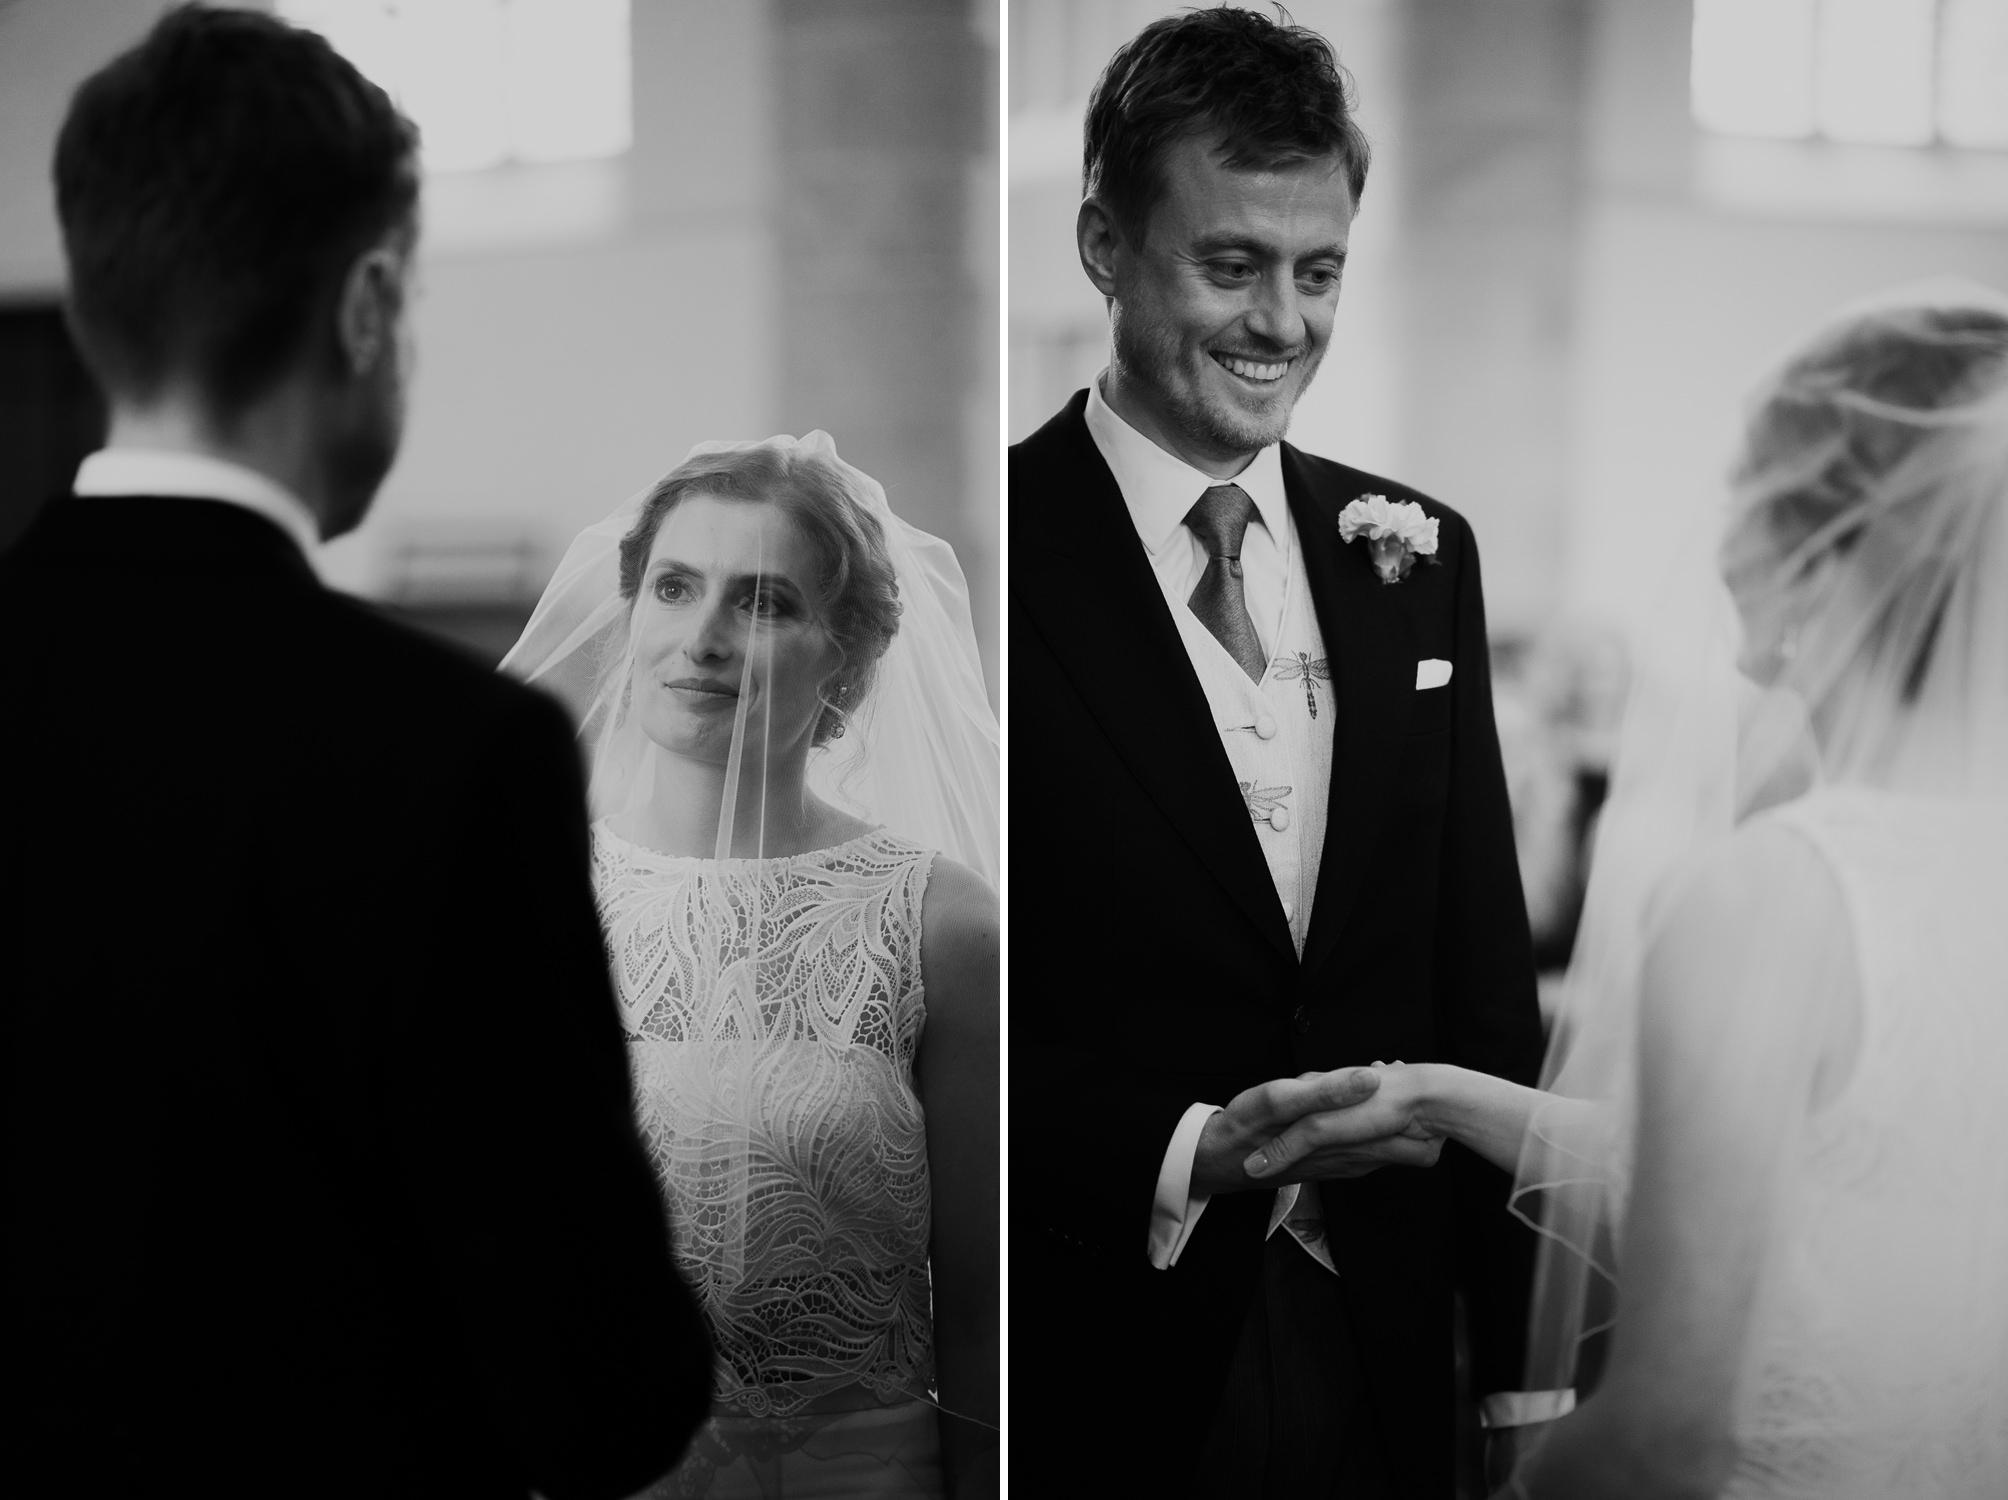 wedding vows photography photographer mark hadden amsterdam